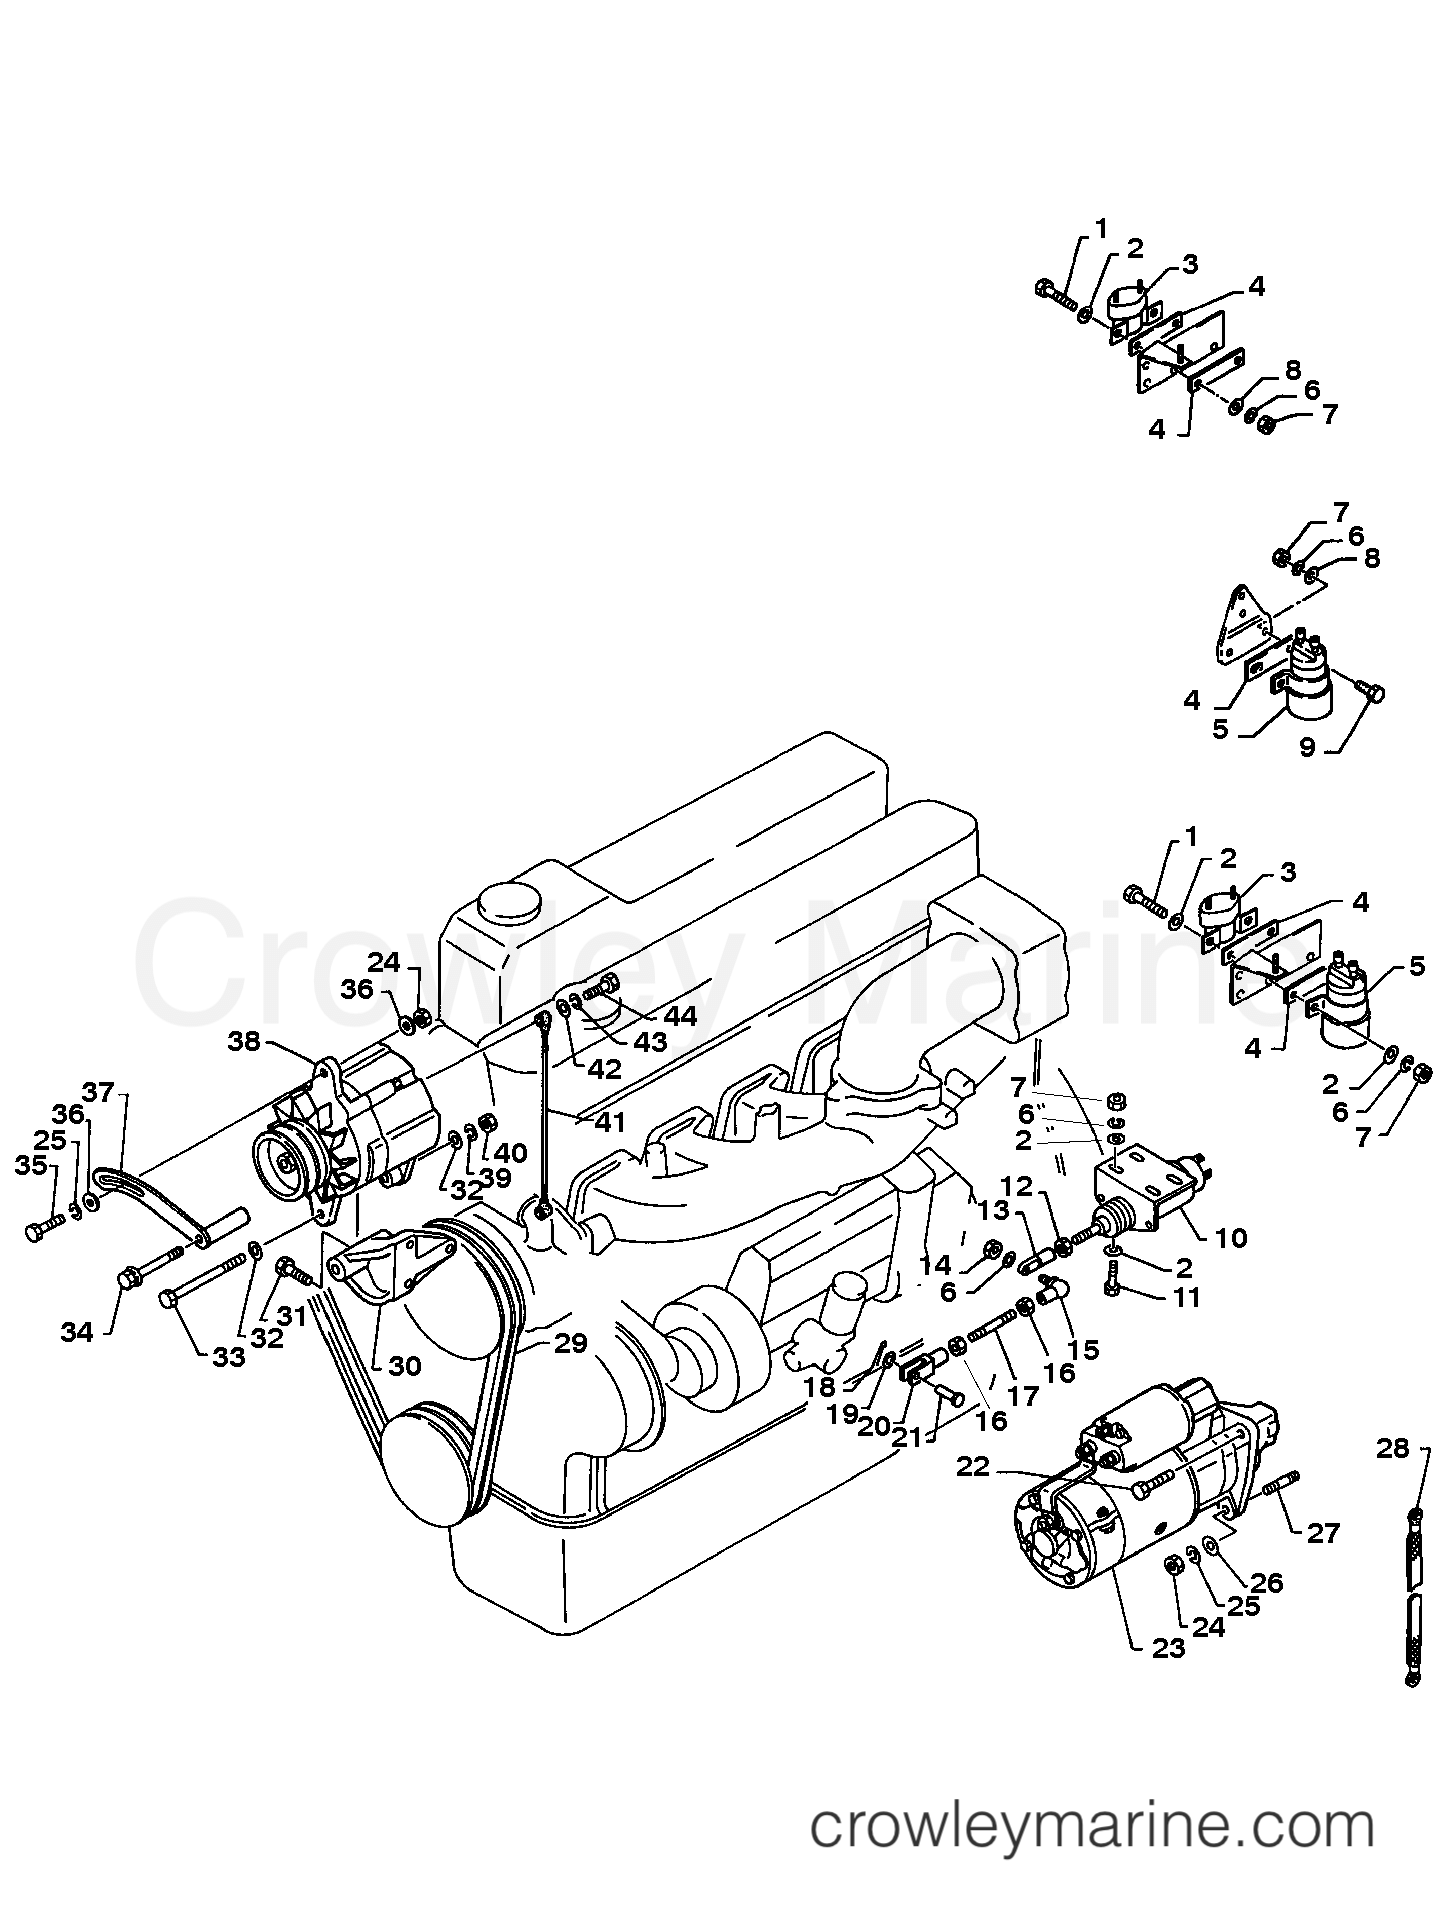 Serial Range Mercruiser EH700 (175/220HP) HINO 393 I/L6 - ALL